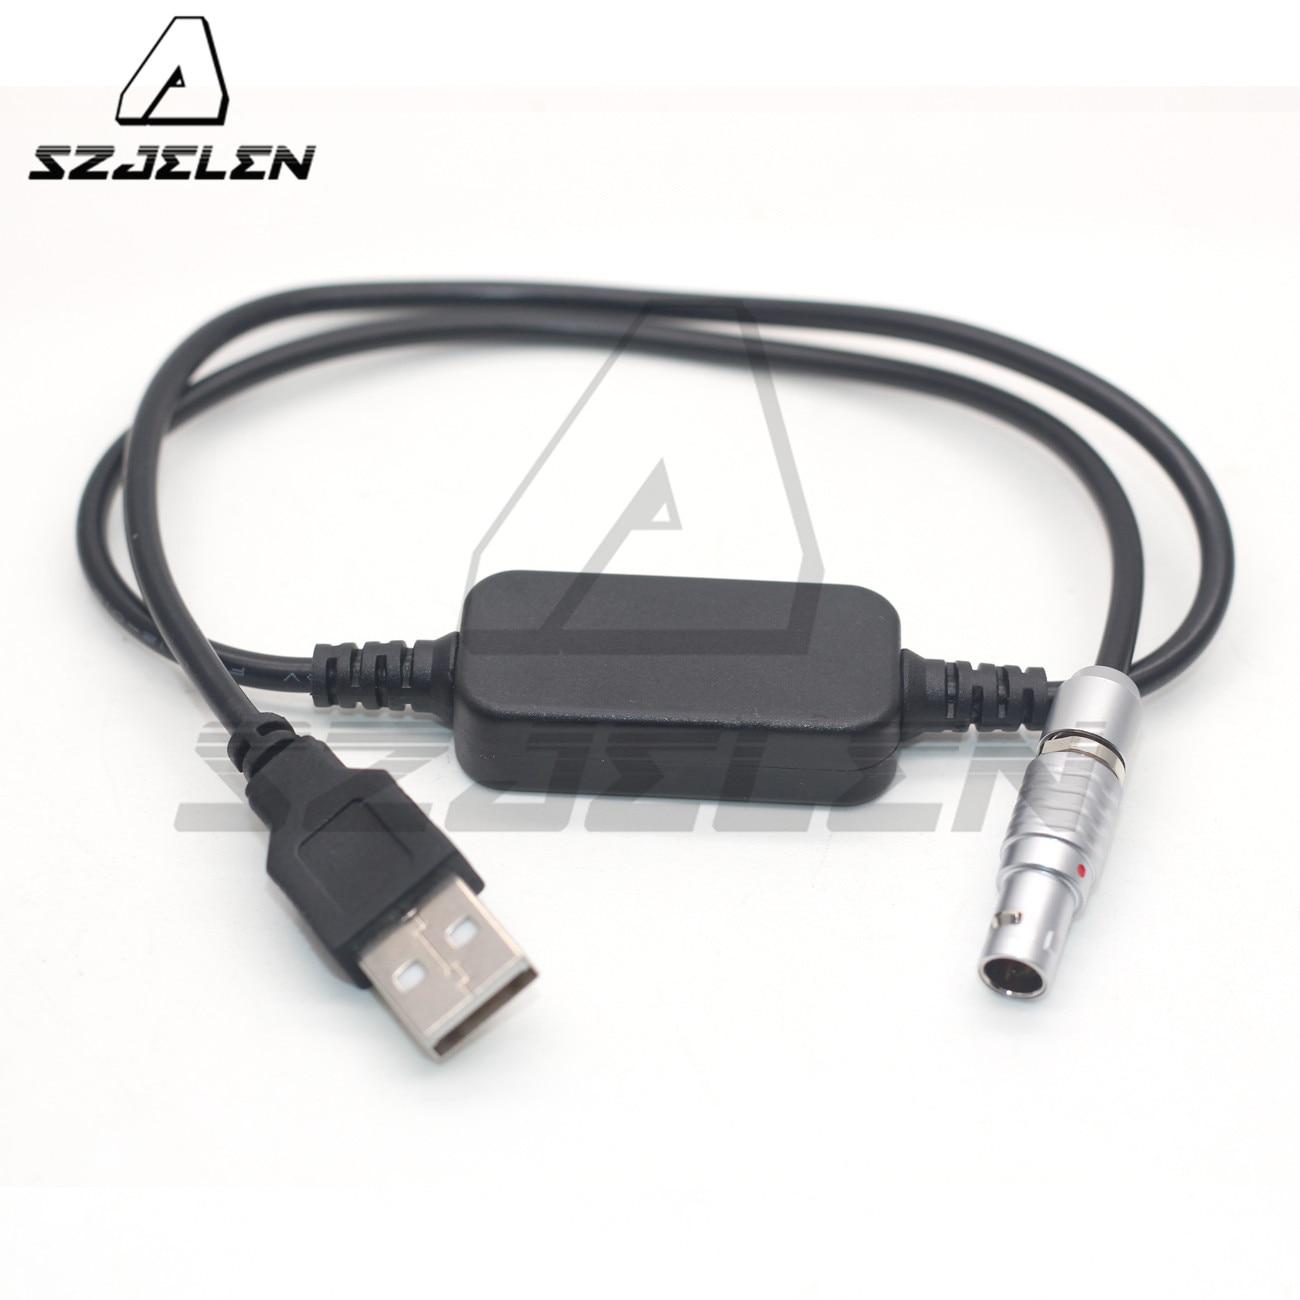 Teradek الترباس برو 1000/3000ft الطاقة كابل دفعة 12V USB إلى 0B 2pin 60 سنتيمتر